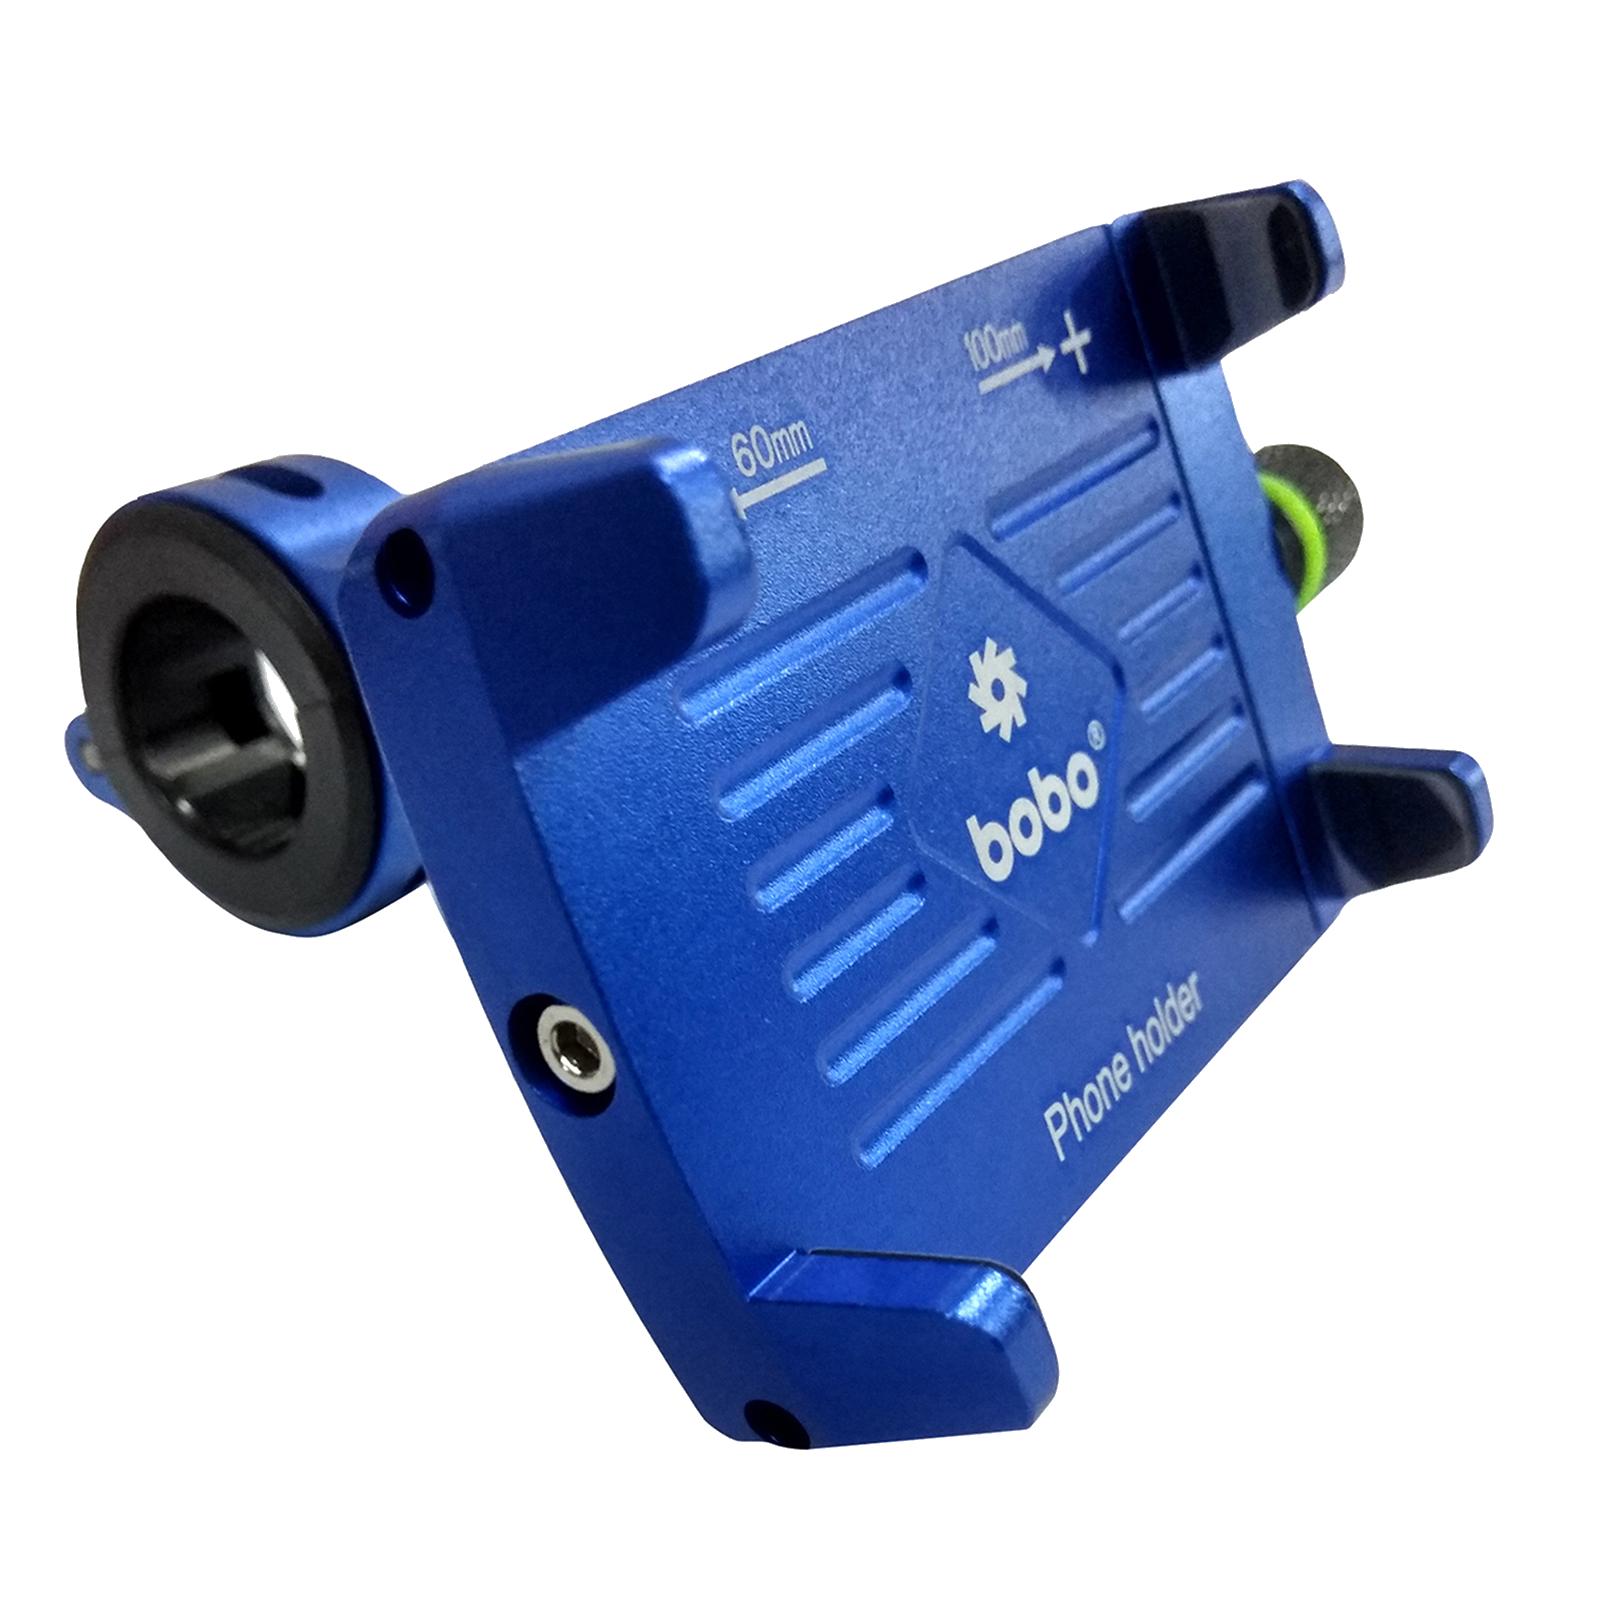 Bobo BM3 Claw-Grip Aluminium Mounting Kit For Bike (Anti-Slip Silicon Pad, BB-BM-003-001003, Blue)_1